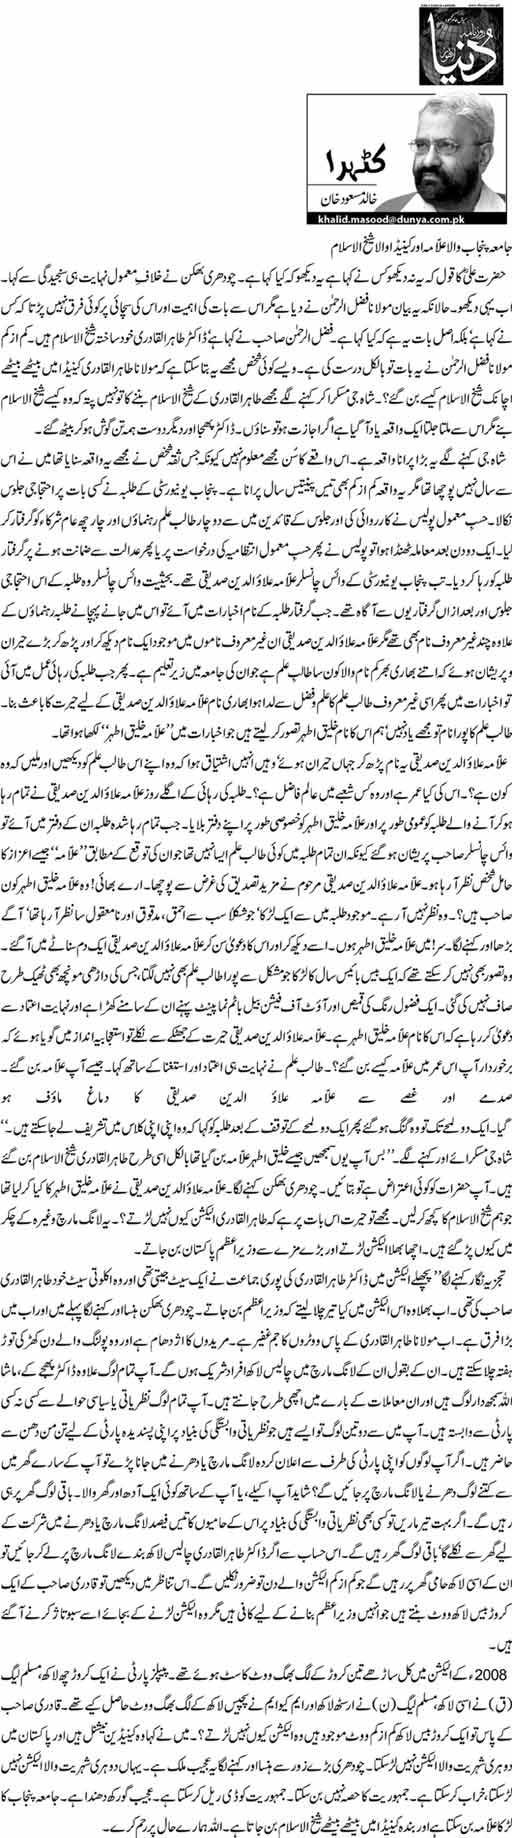 Jamia Punjab wala Allama aur Canada wala Shaikh ul Islam - Khalid Masood Khan